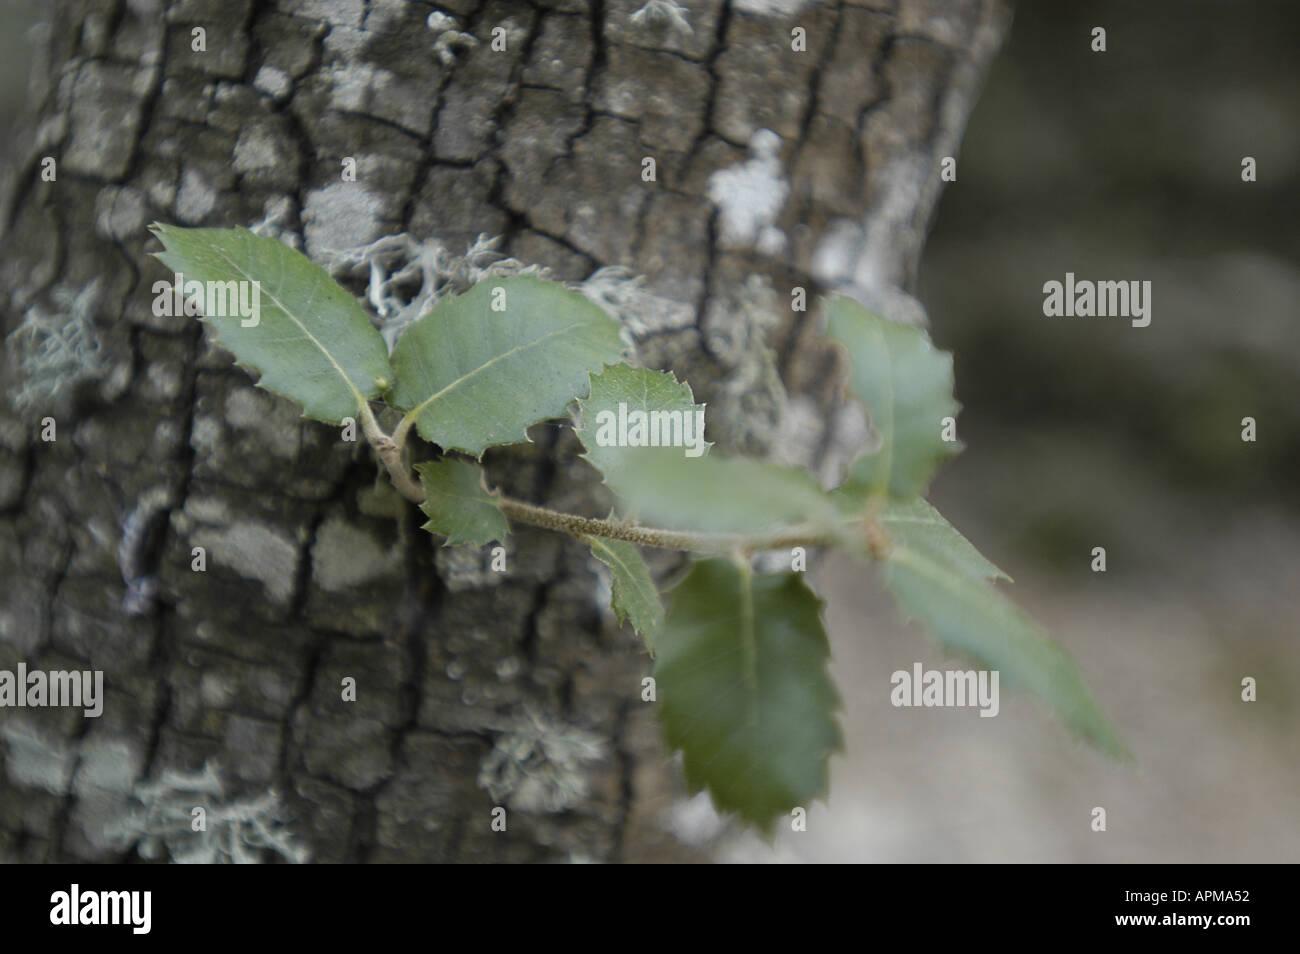 Apm Mallorca quercus ilex encina alzina corn tree mallorca majorca spain balearic